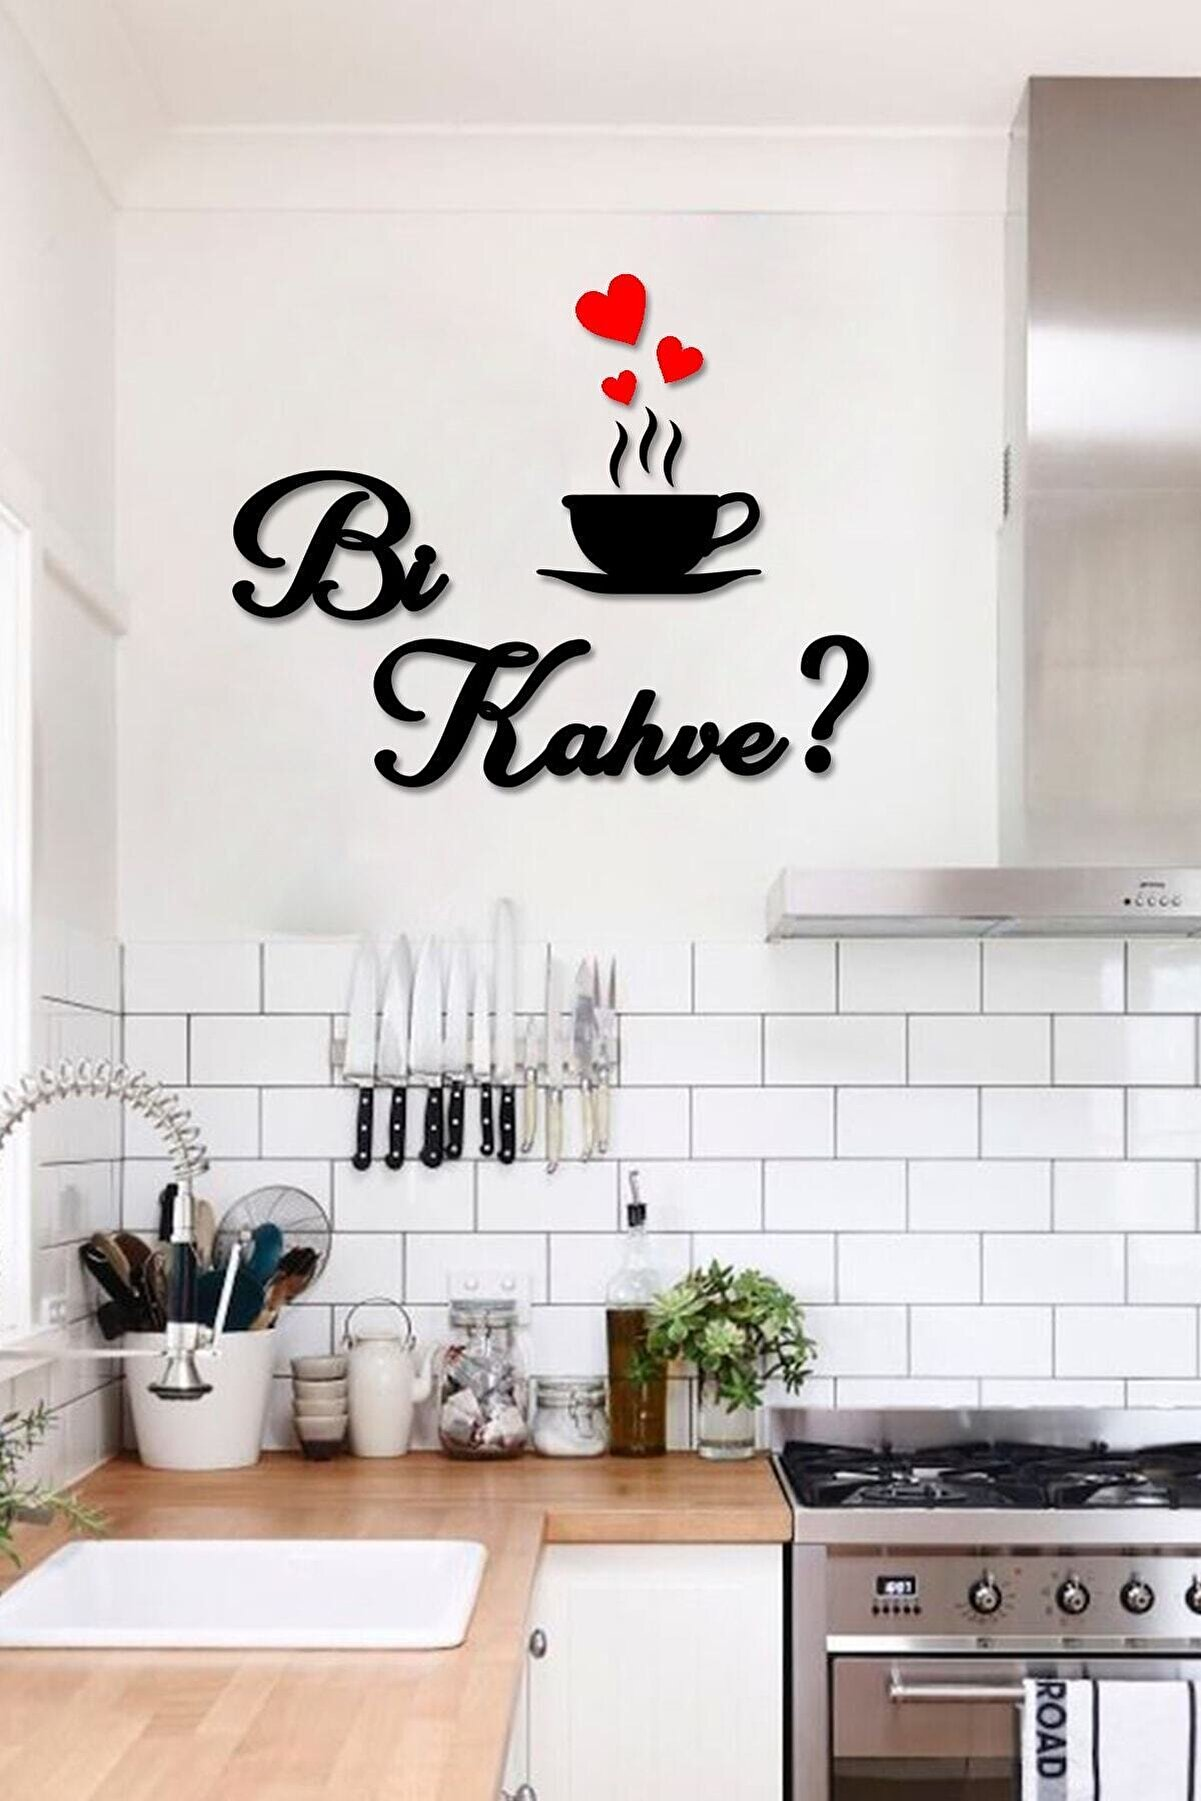 Taktakicat Kahve Ahşap Dekoratif Mutfak Duvar Tablosu